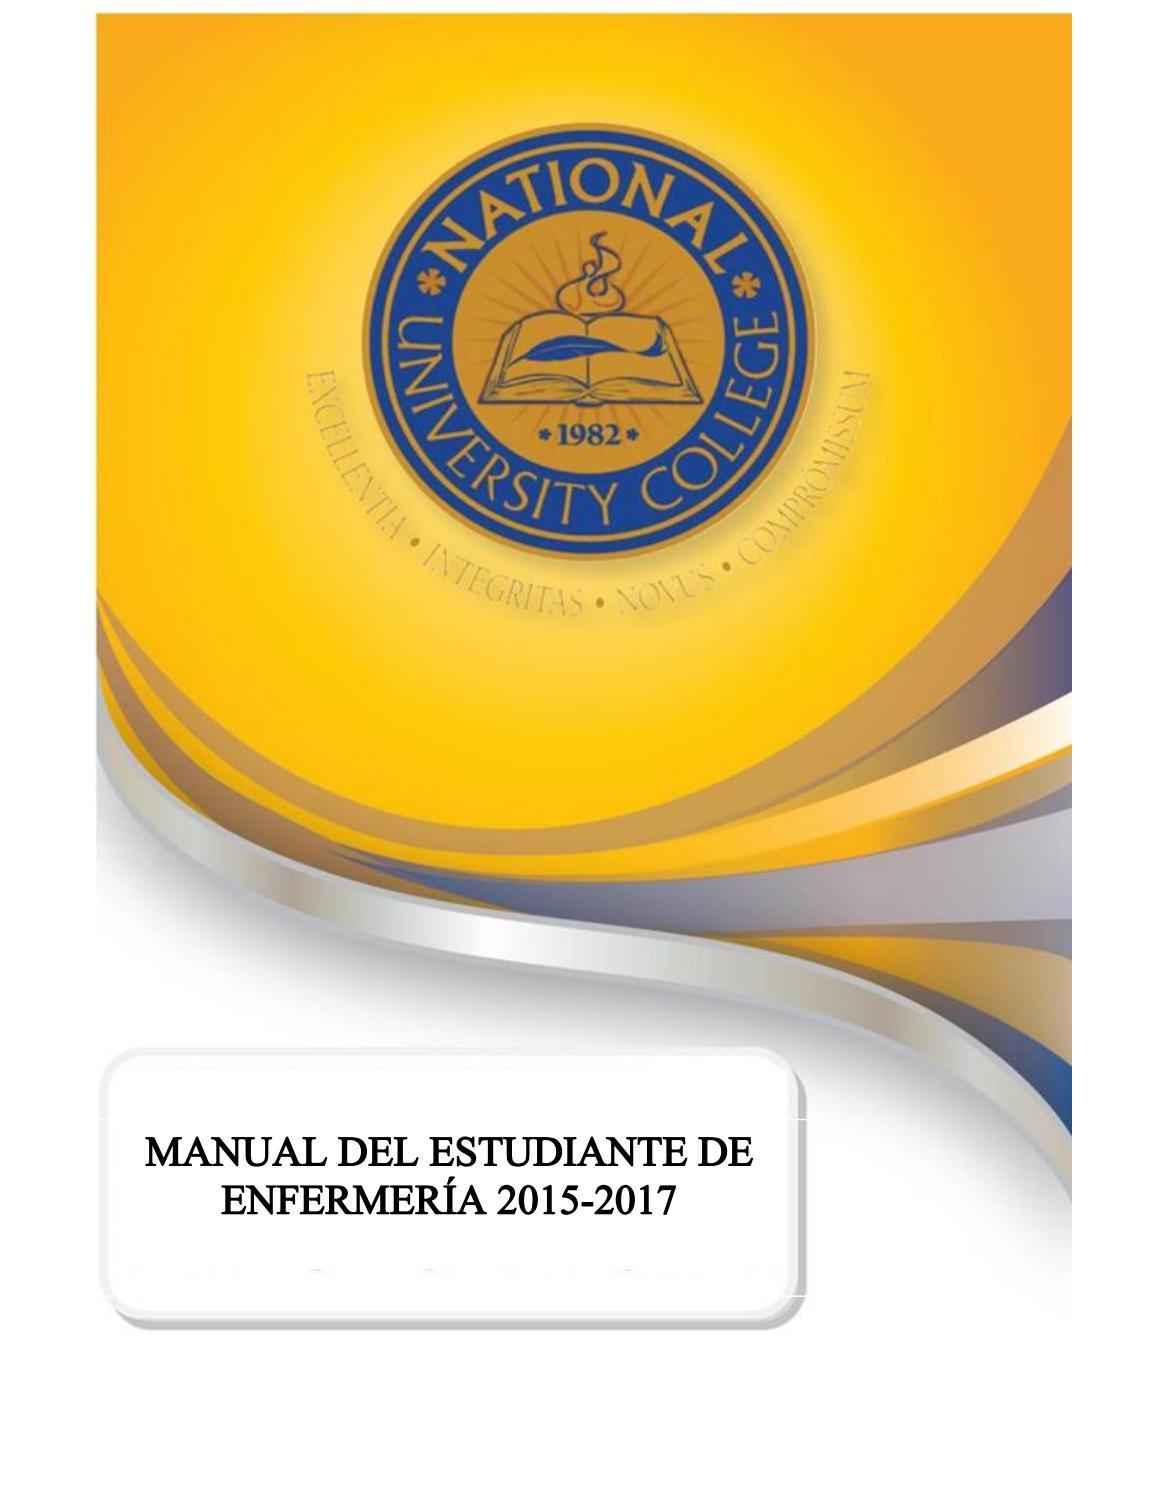 NUC - Manual de enfermería 2015-2017 by Ana Milena - issuu